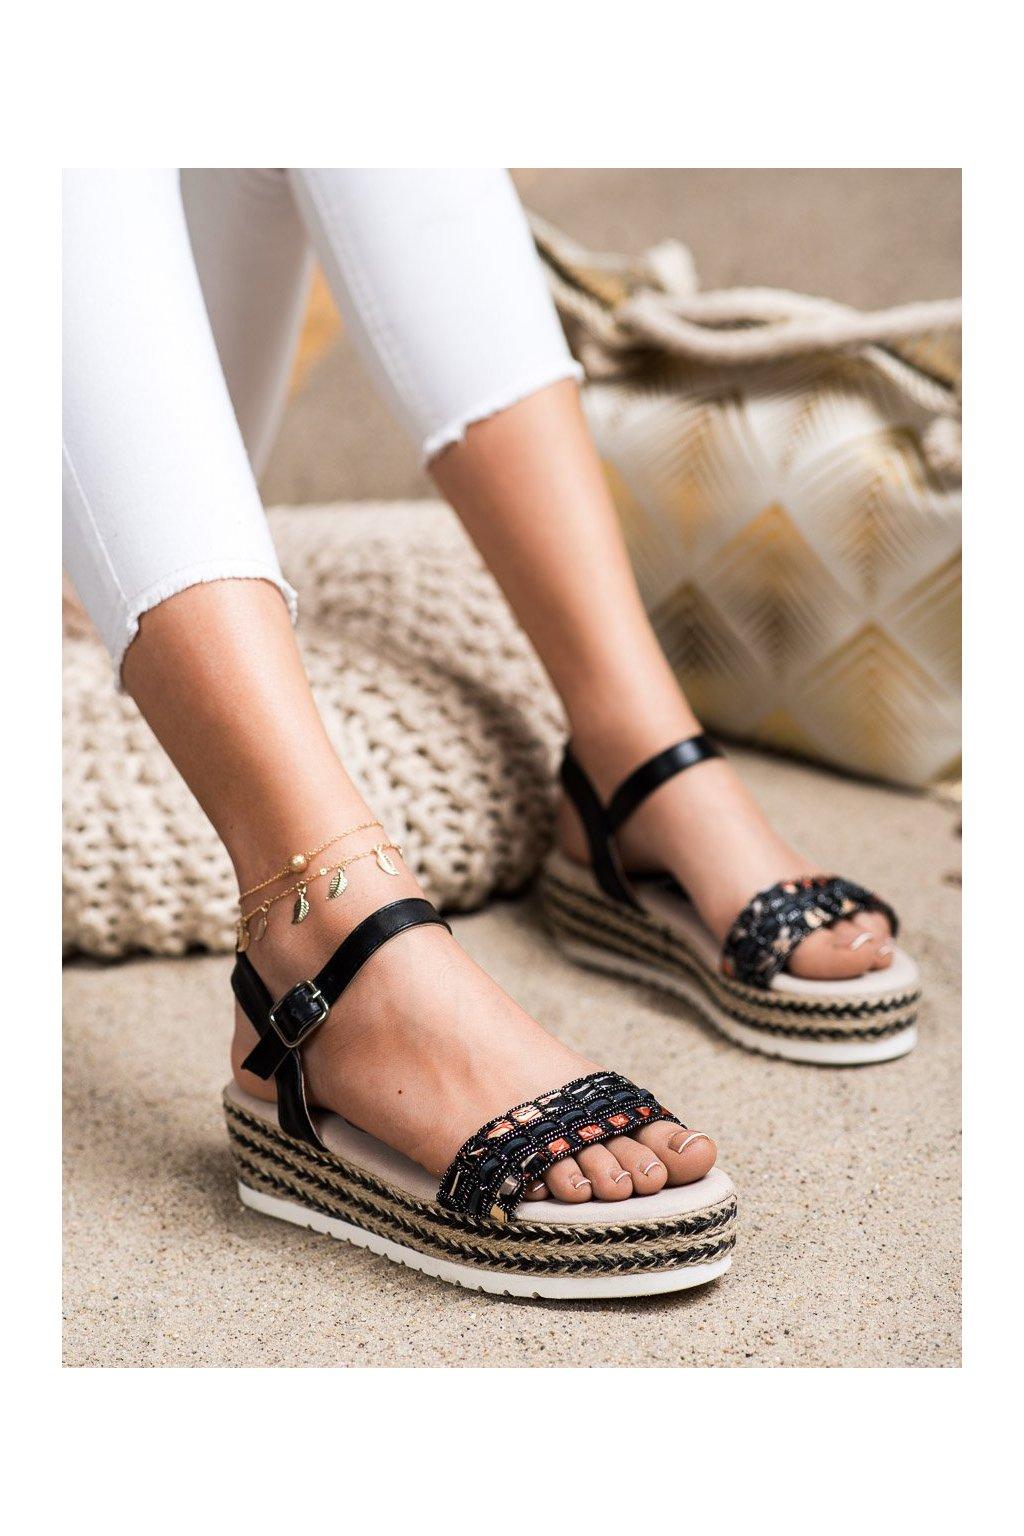 Čierne sandále Shelovet kod B119-09-02NE